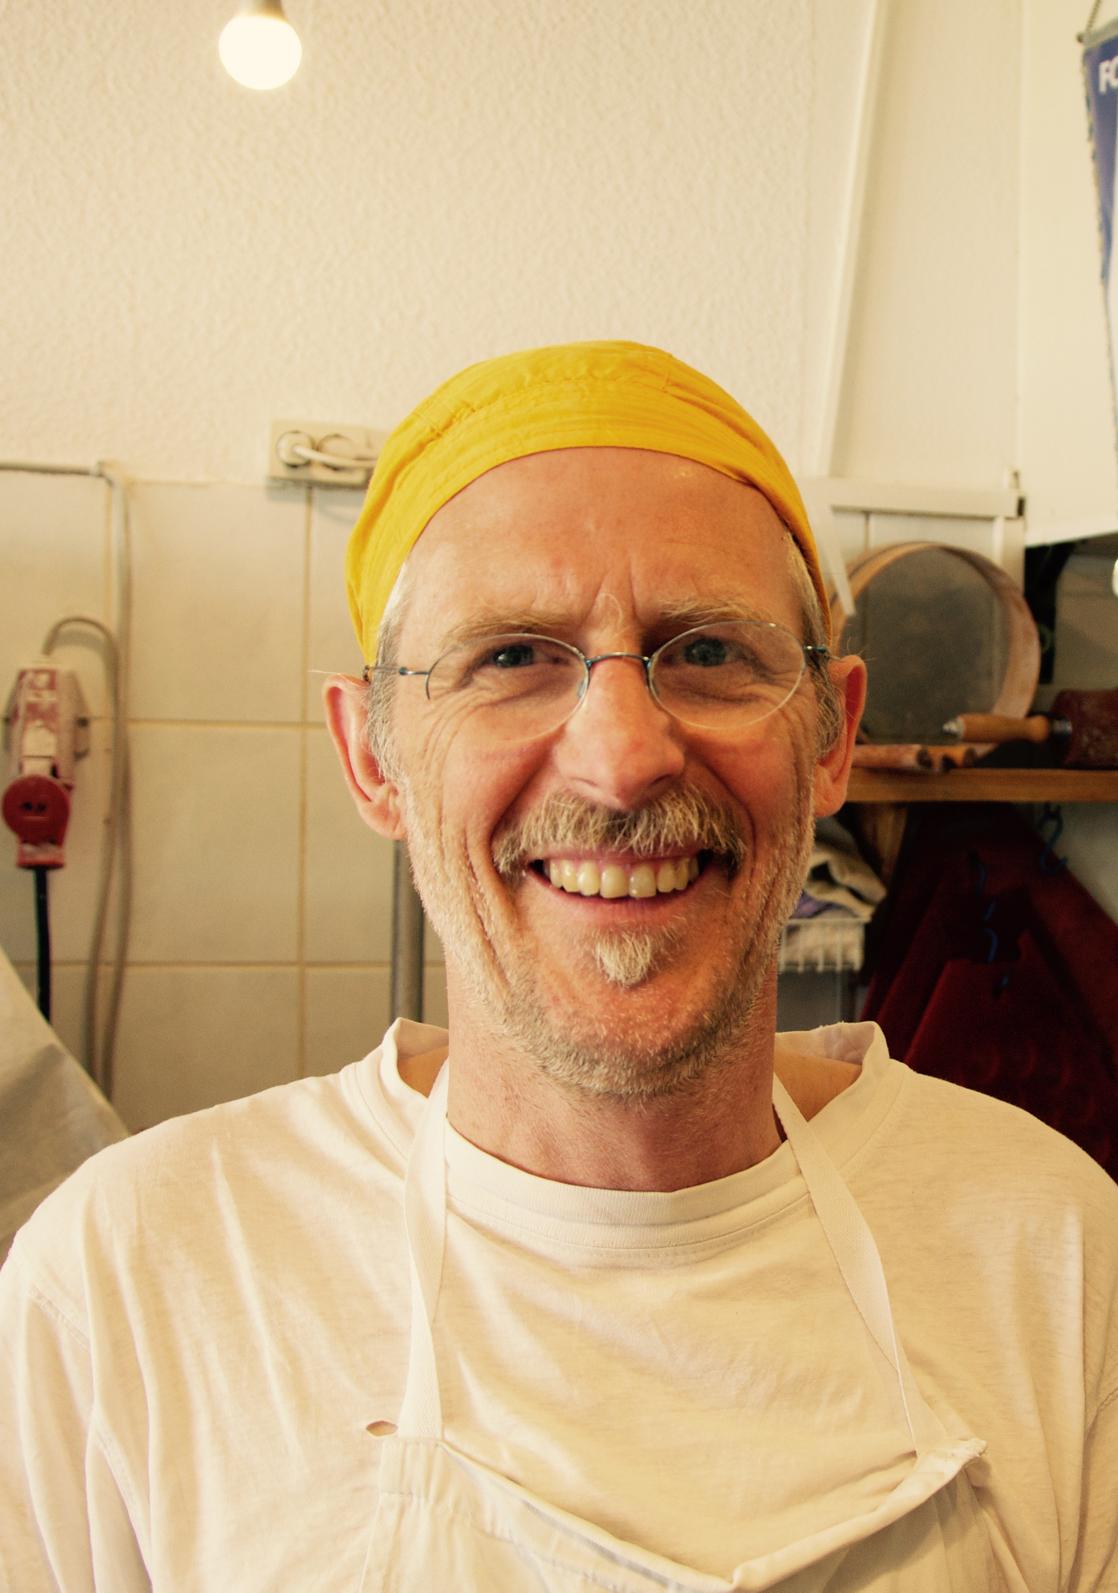 Inhaber Martin Kastner, Klaus-Groth-Strasse 40, 20535 Hamburg, Tel.: 040 / 39 99 00 43,  E-Mail: rettungsbrot@gmx.de, www.bio-baeckerei-rettungsbrot.de